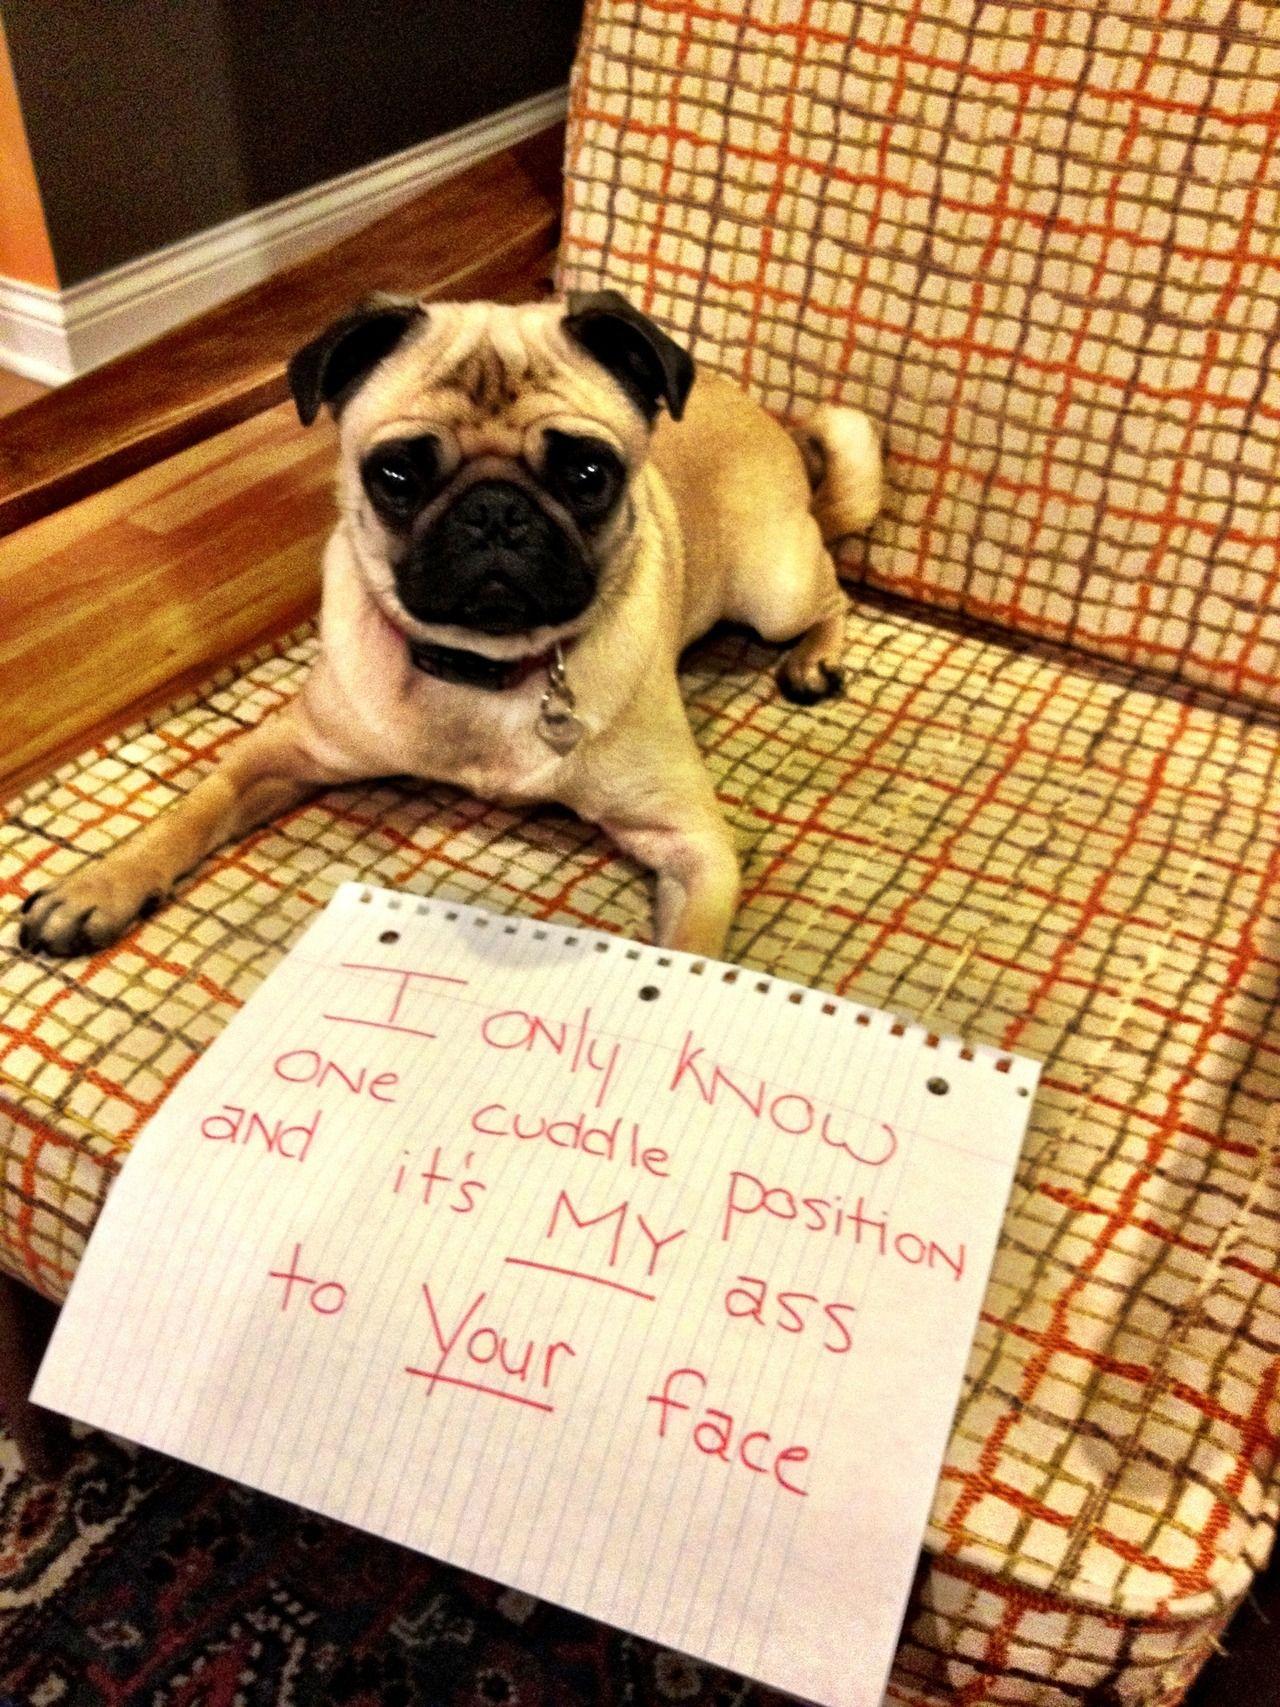 Dogshaming Humiliating Dogs For Bad Behavior Dog Shaming Pugs